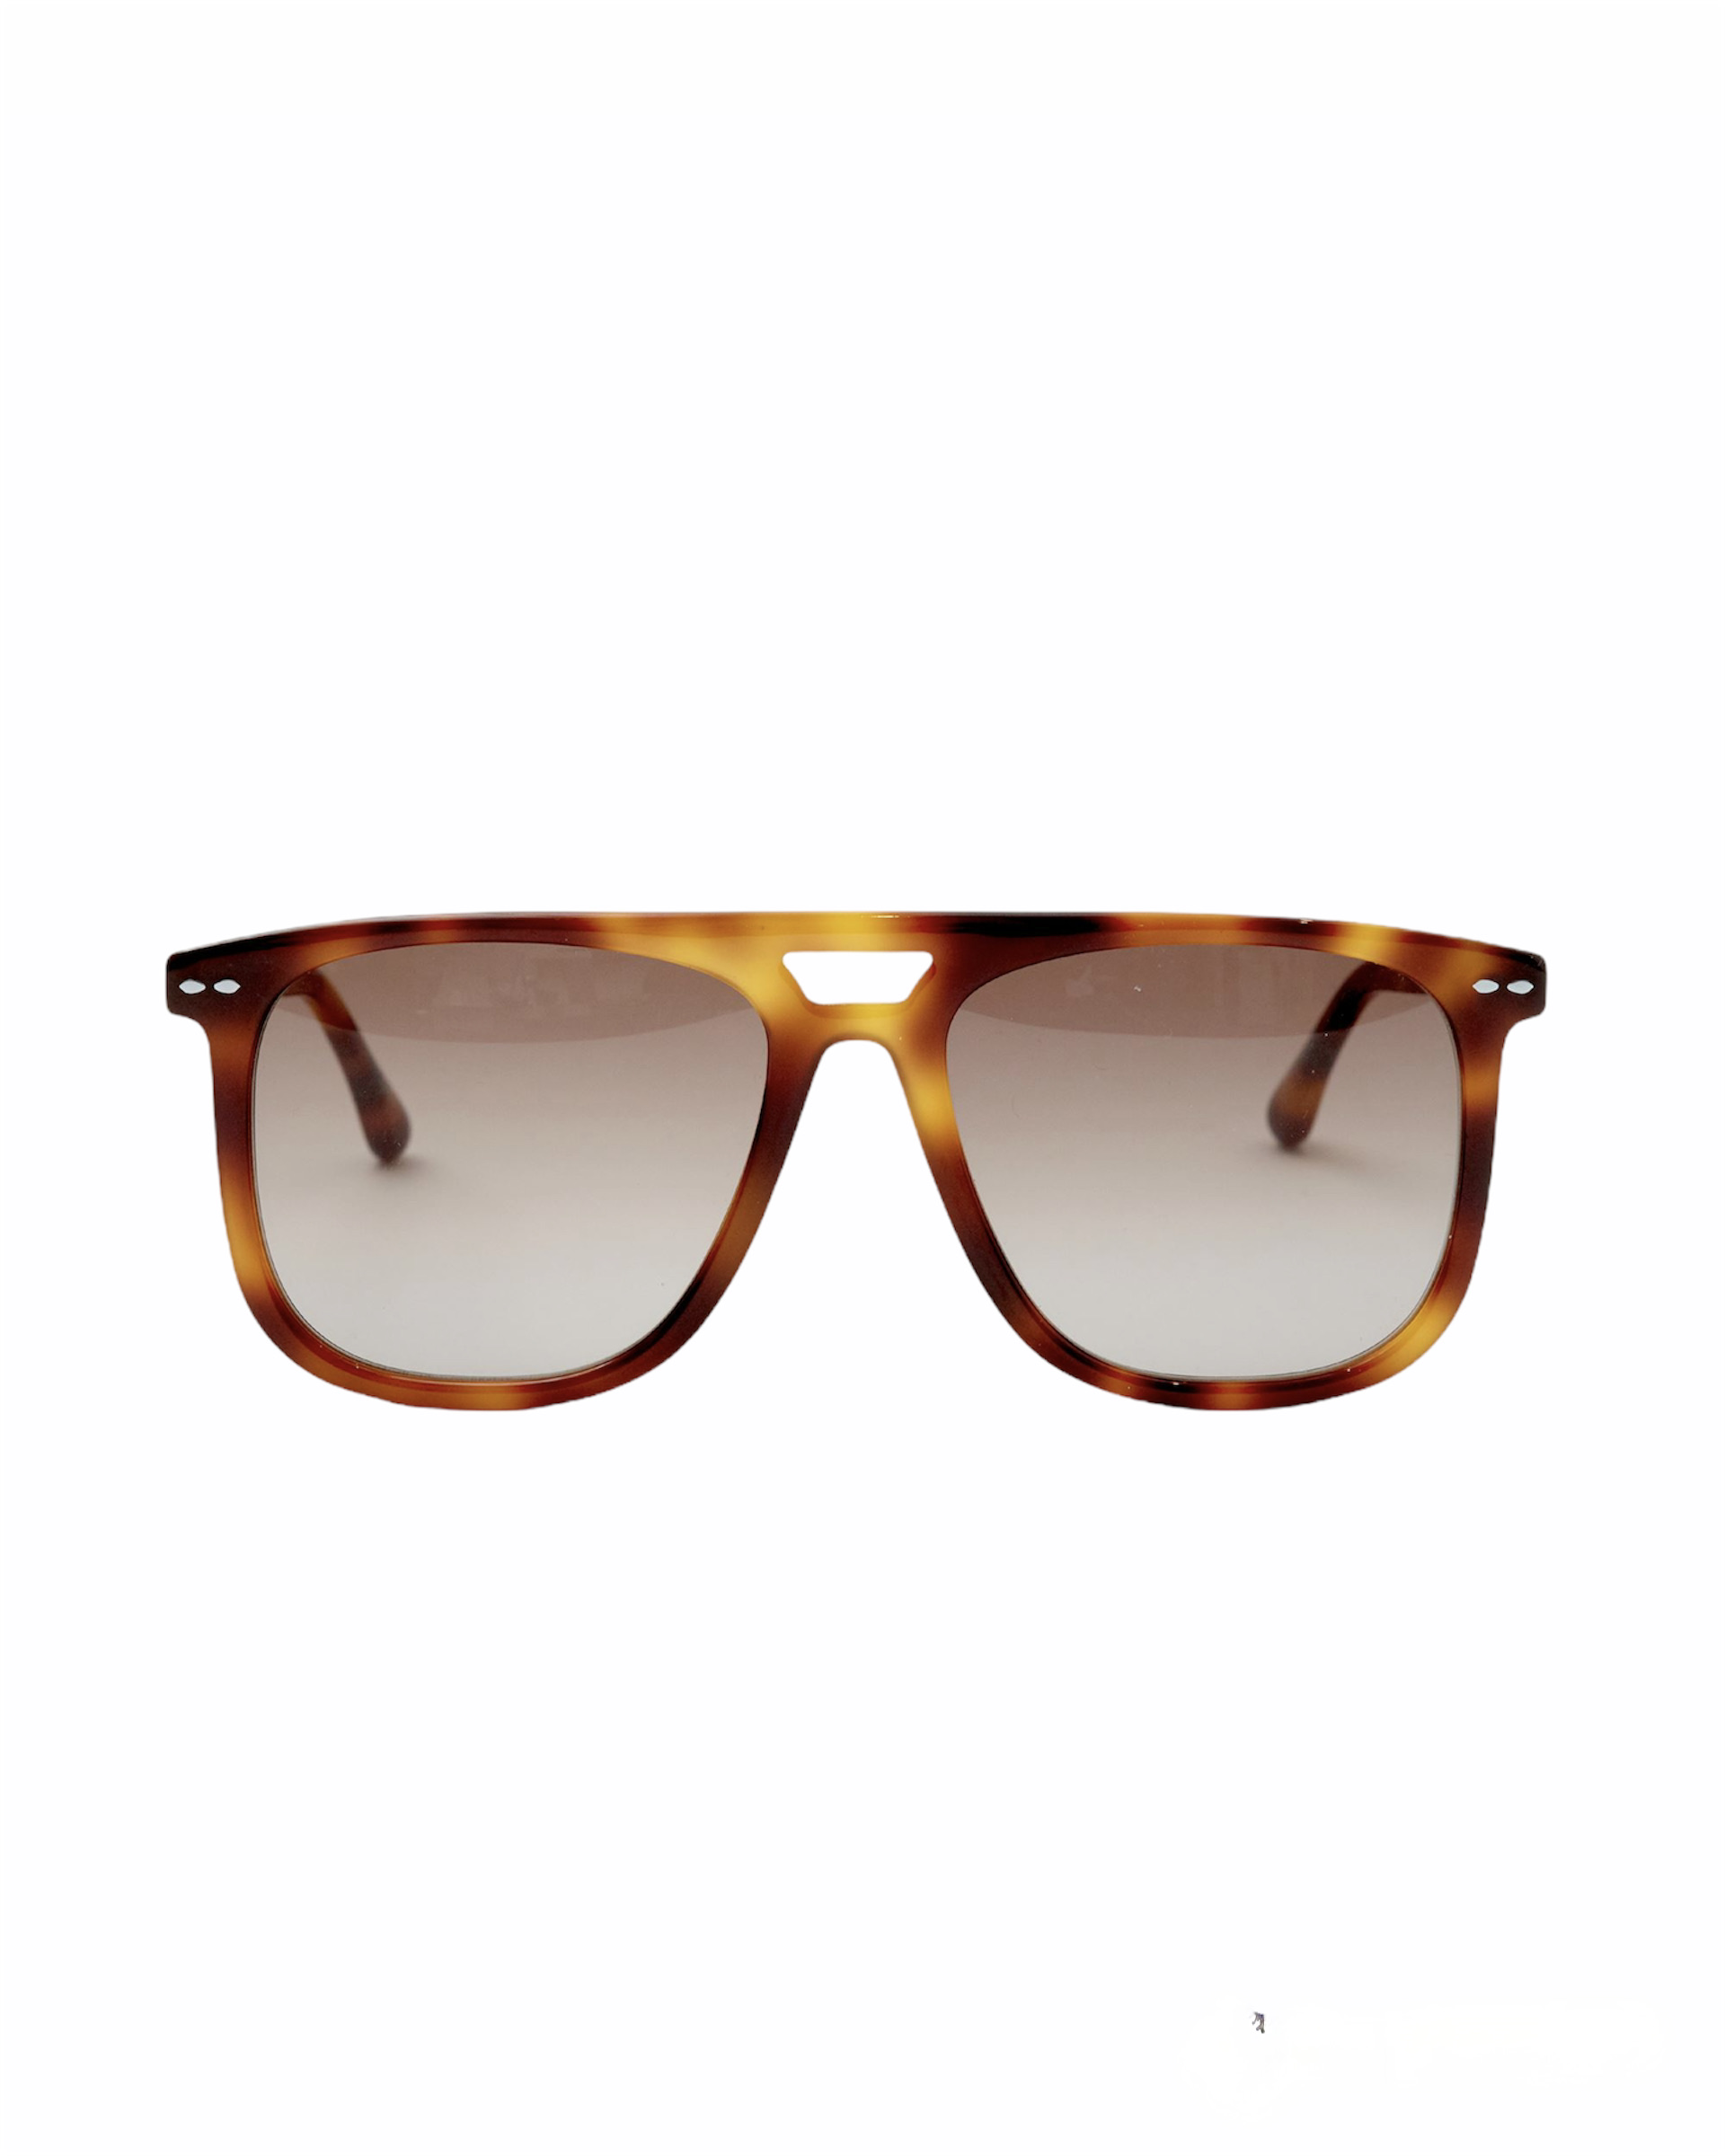 Sonnenbrille, Nima, Isabel Marant, Sunglasses